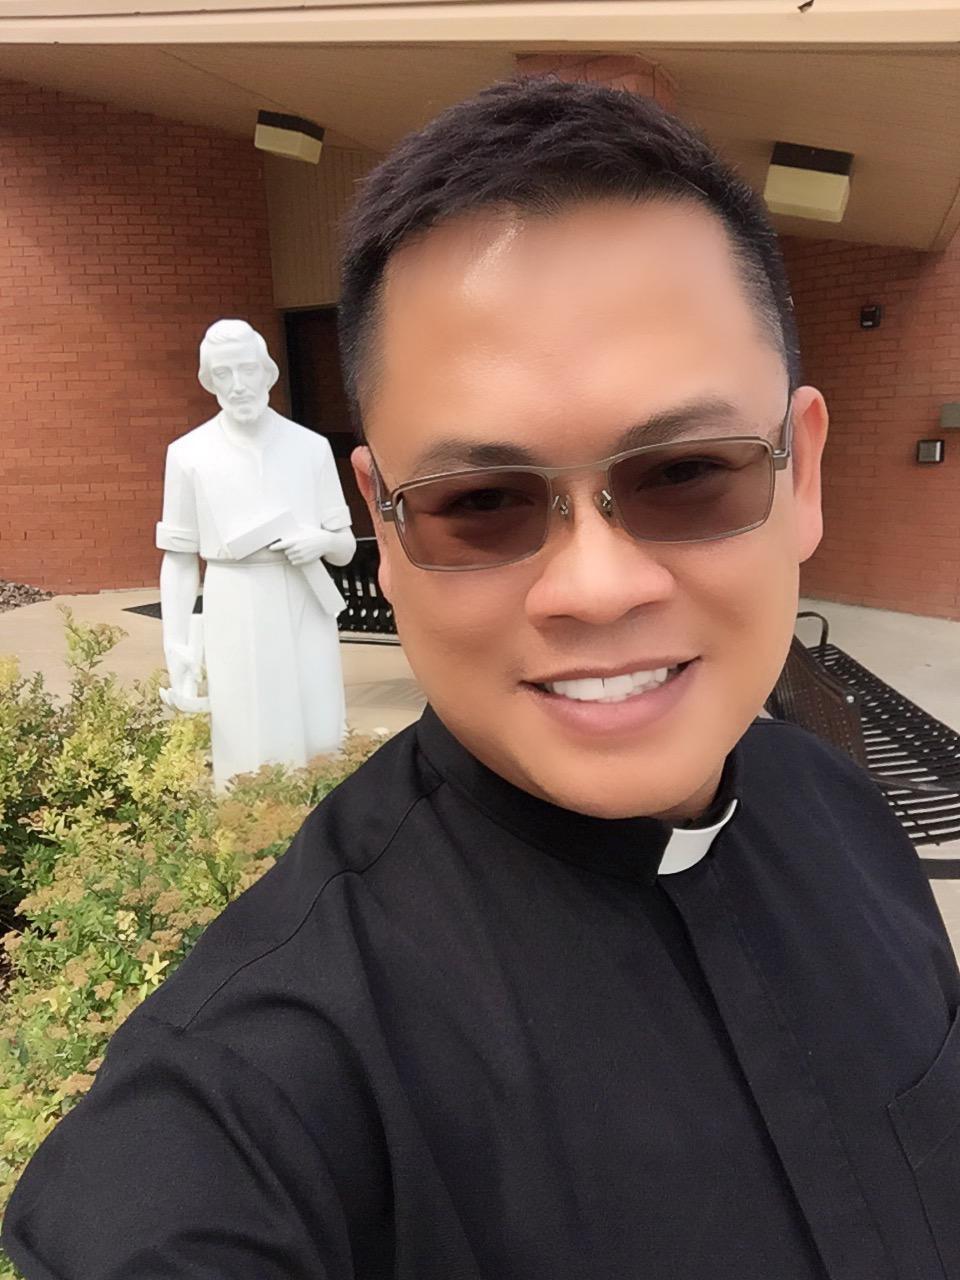 father joseph tran - photo #5